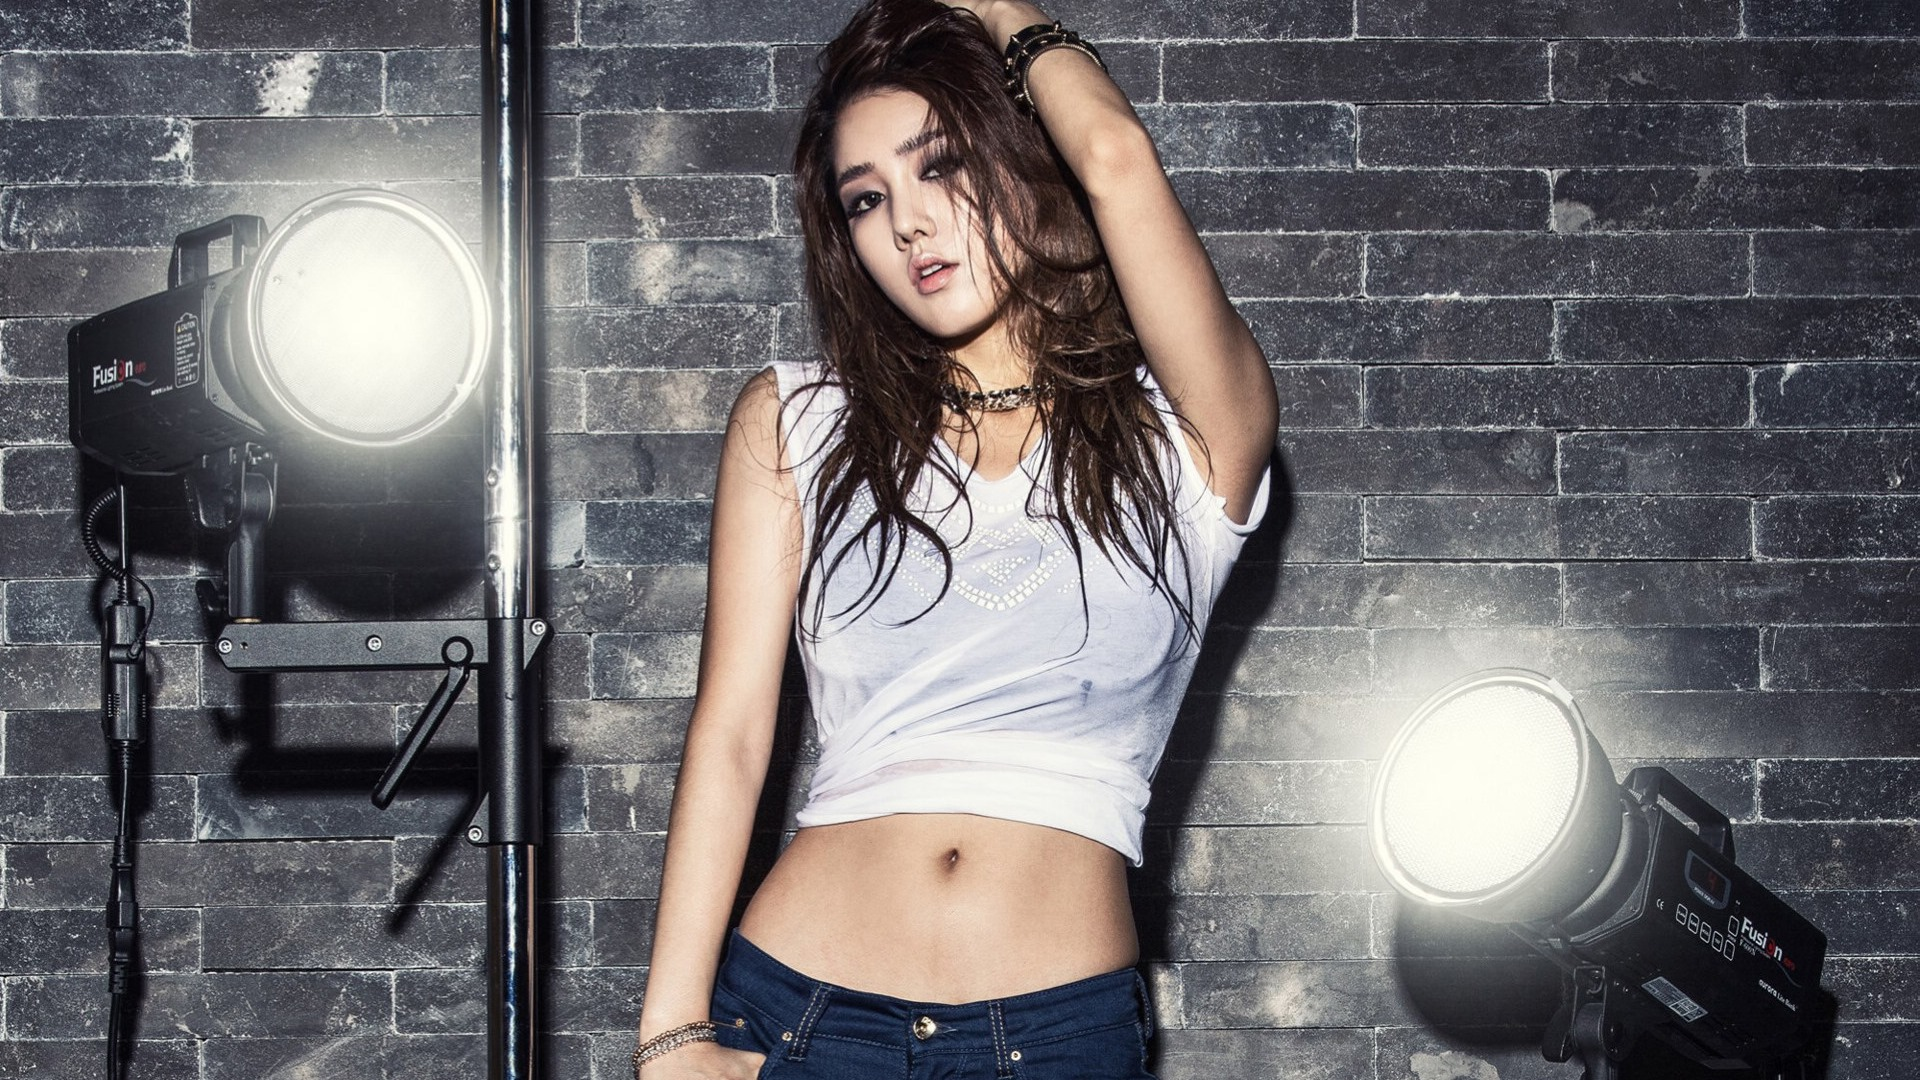 Spica Korean girls music idol combination HD wallpapers #7